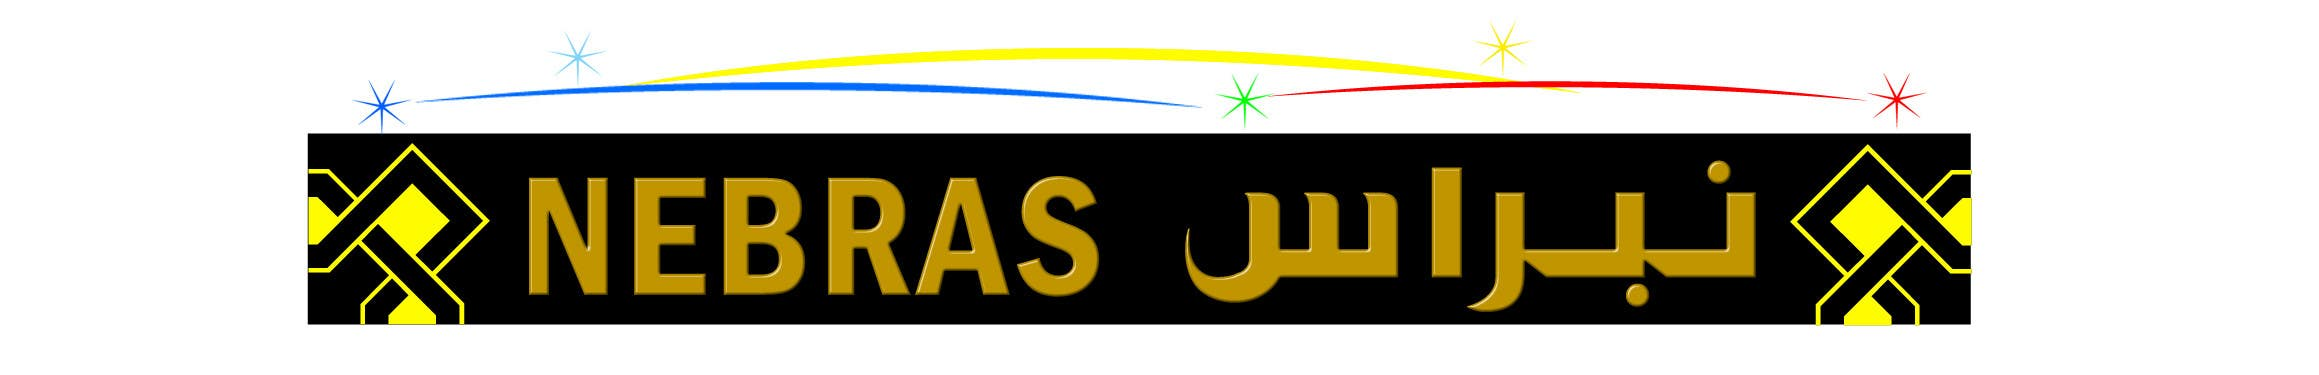 Kilpailutyö #                                        27                                      kilpailussa                                         Design a logo for company called Nebras